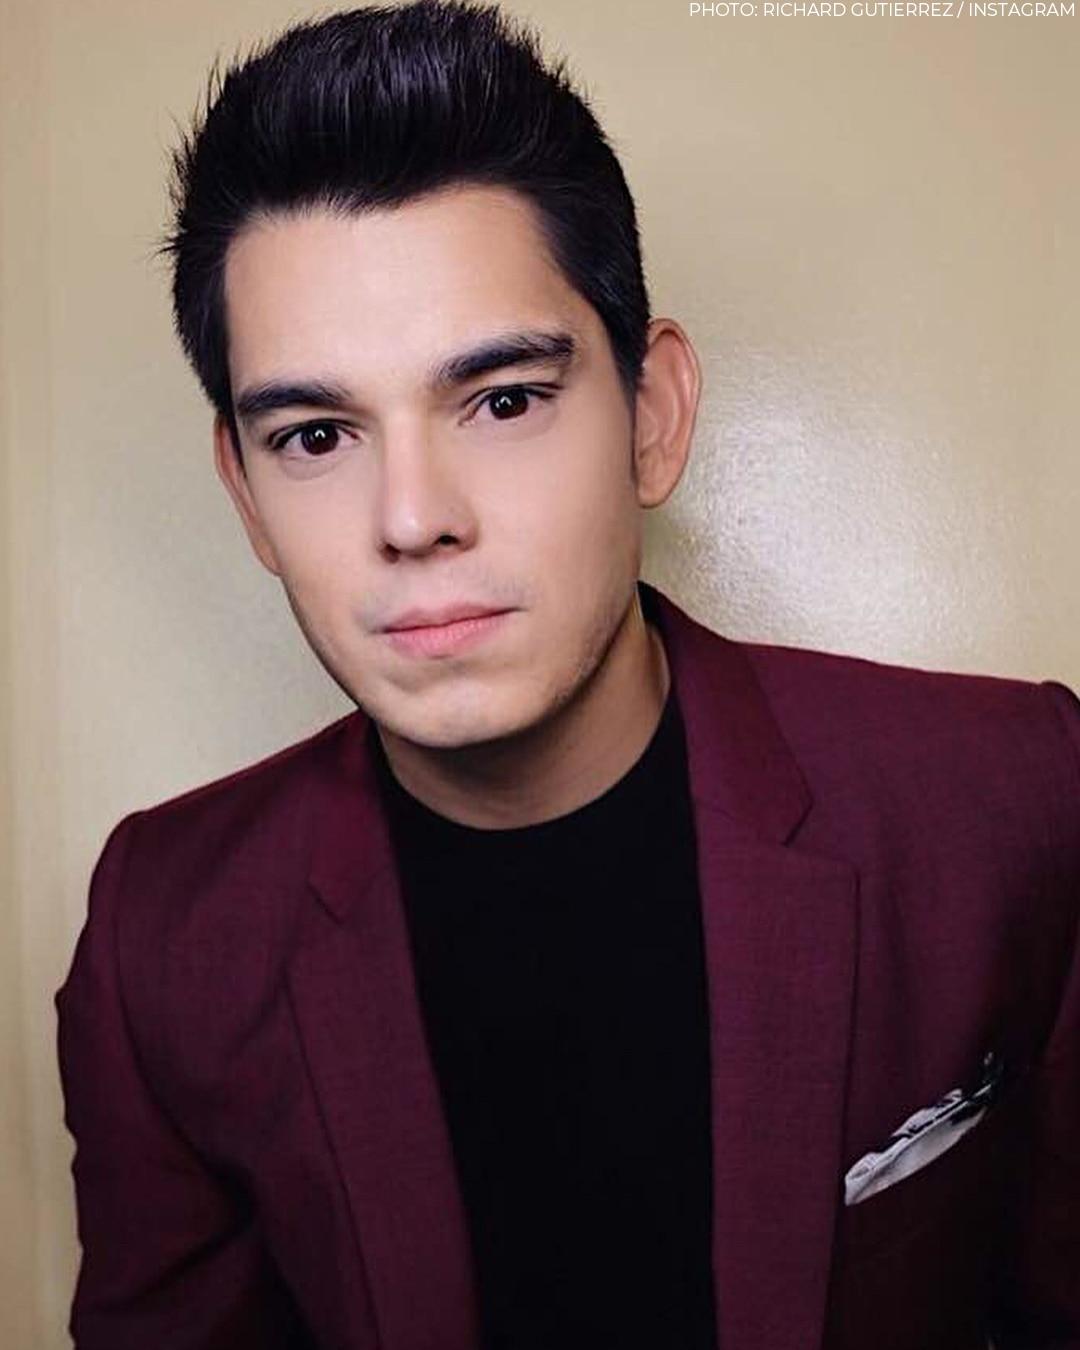 Richard Gutierrez' most handsome looks